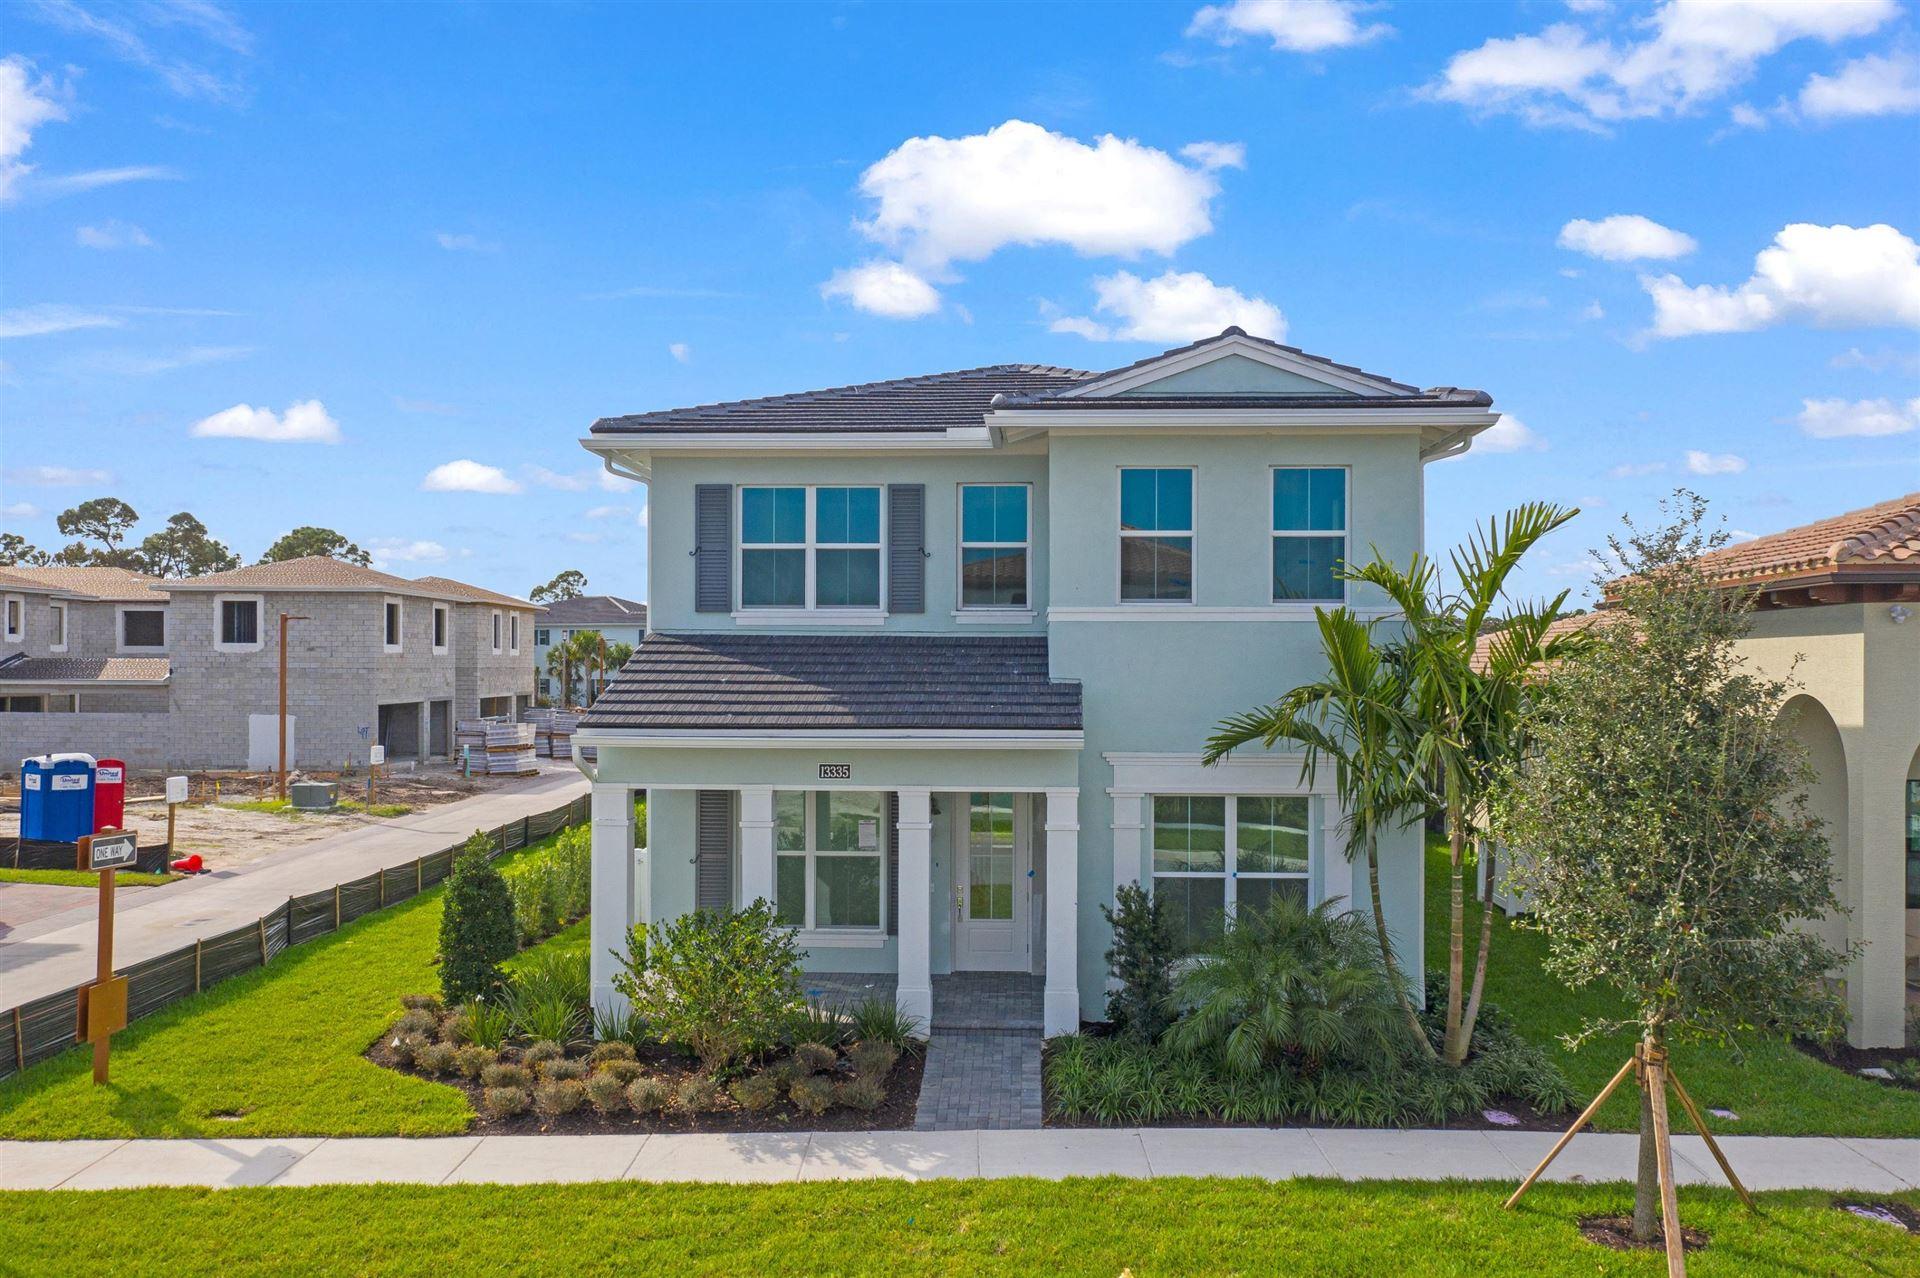 13335 Machiavelli Way, Palm Beach Gardens, FL 33410 - #: RX-10684979